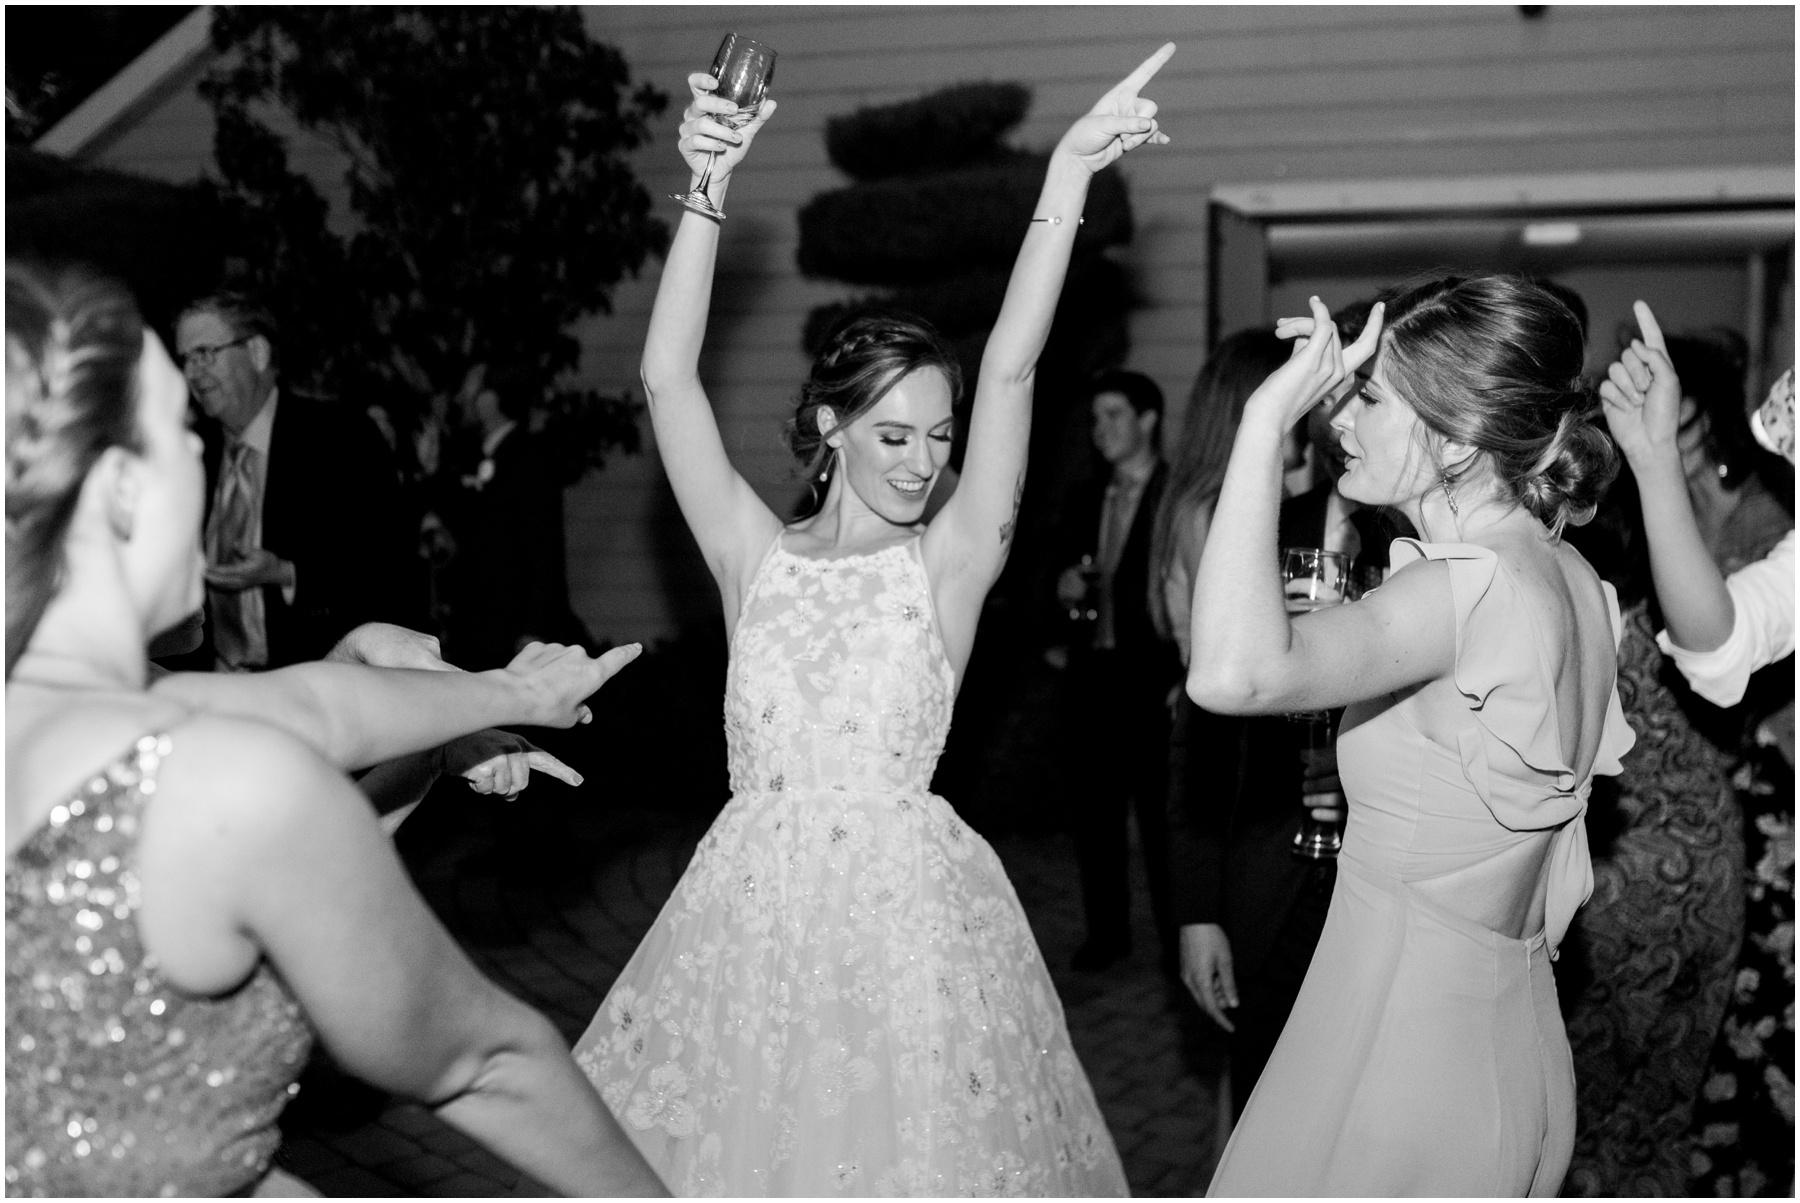 Scribner-bend-vineyards-wedding-sacramento-california-Kristine-Herman-Photography-222.jpg